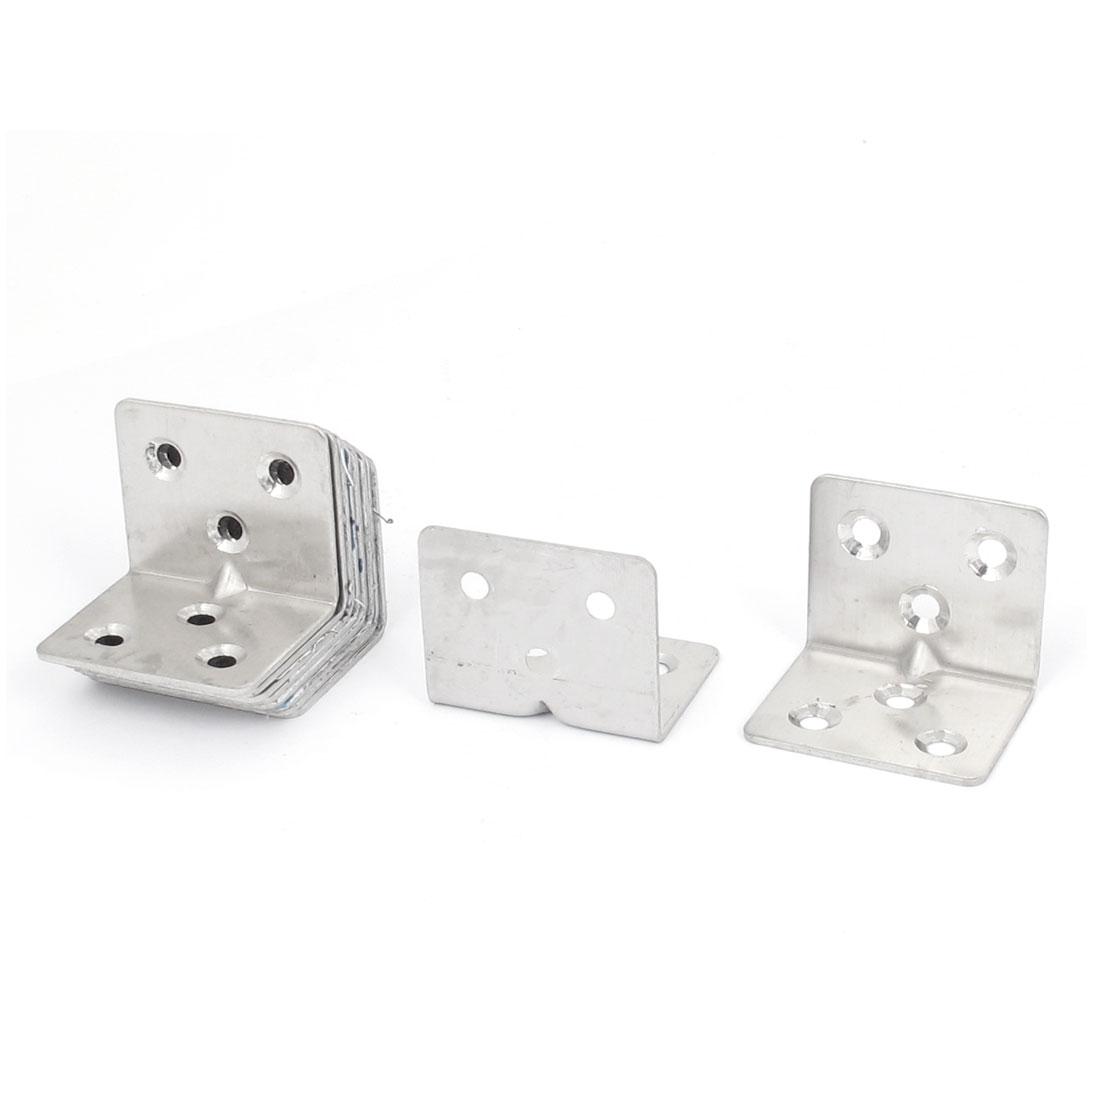 30mmx30mmx38mm L Shape Corner Brace Repair Right Angle Bracket Shelf Support 10pcs